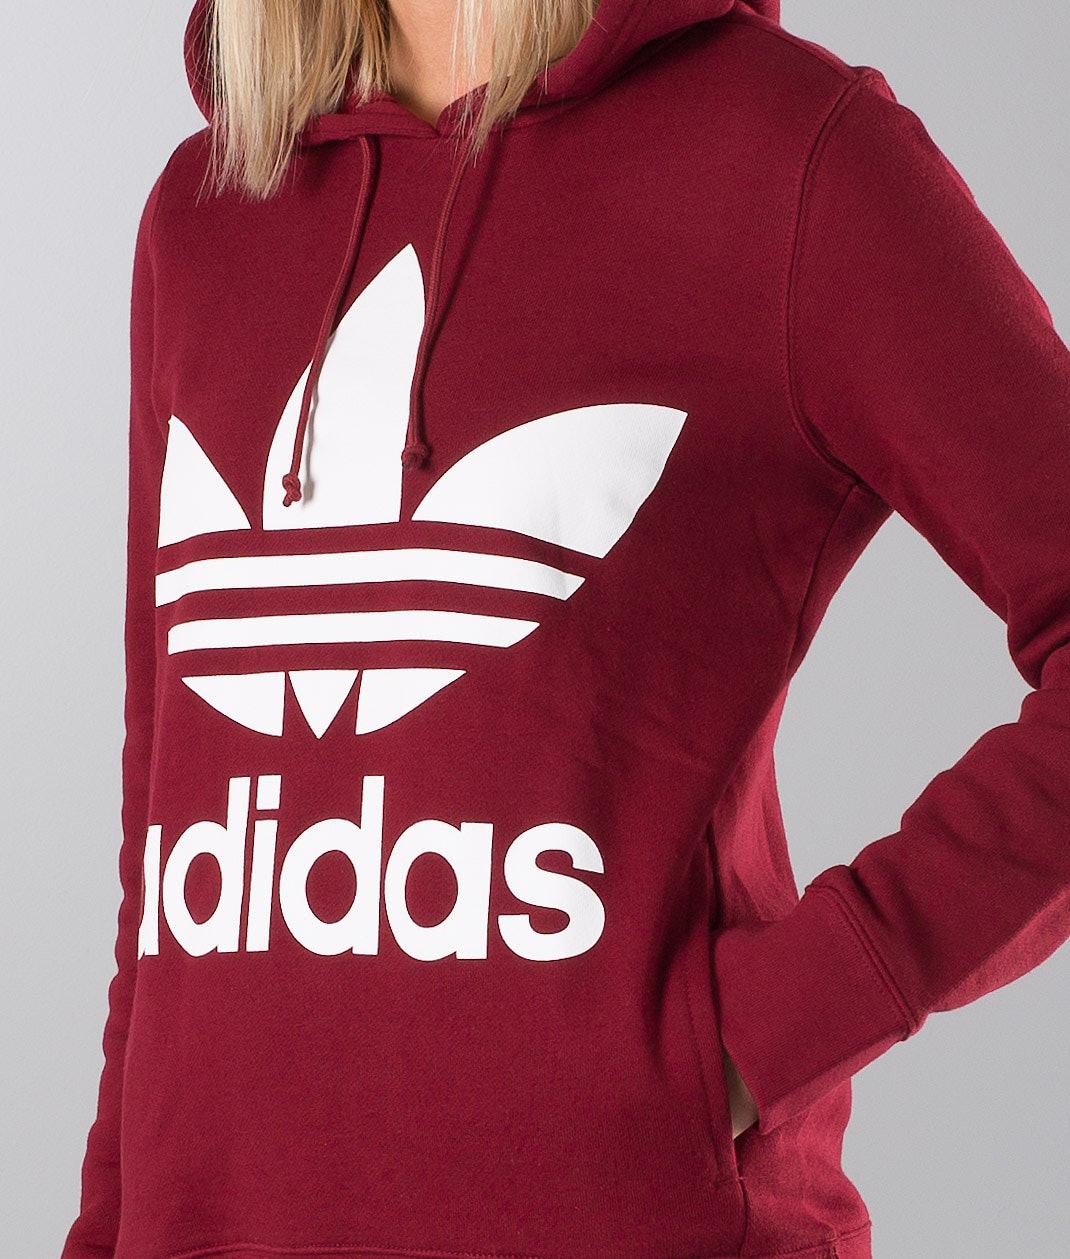 1e0ec6d902a Adidas Originals Trefoil Hoodie Collegiate Burgundy - Ridestore.nl